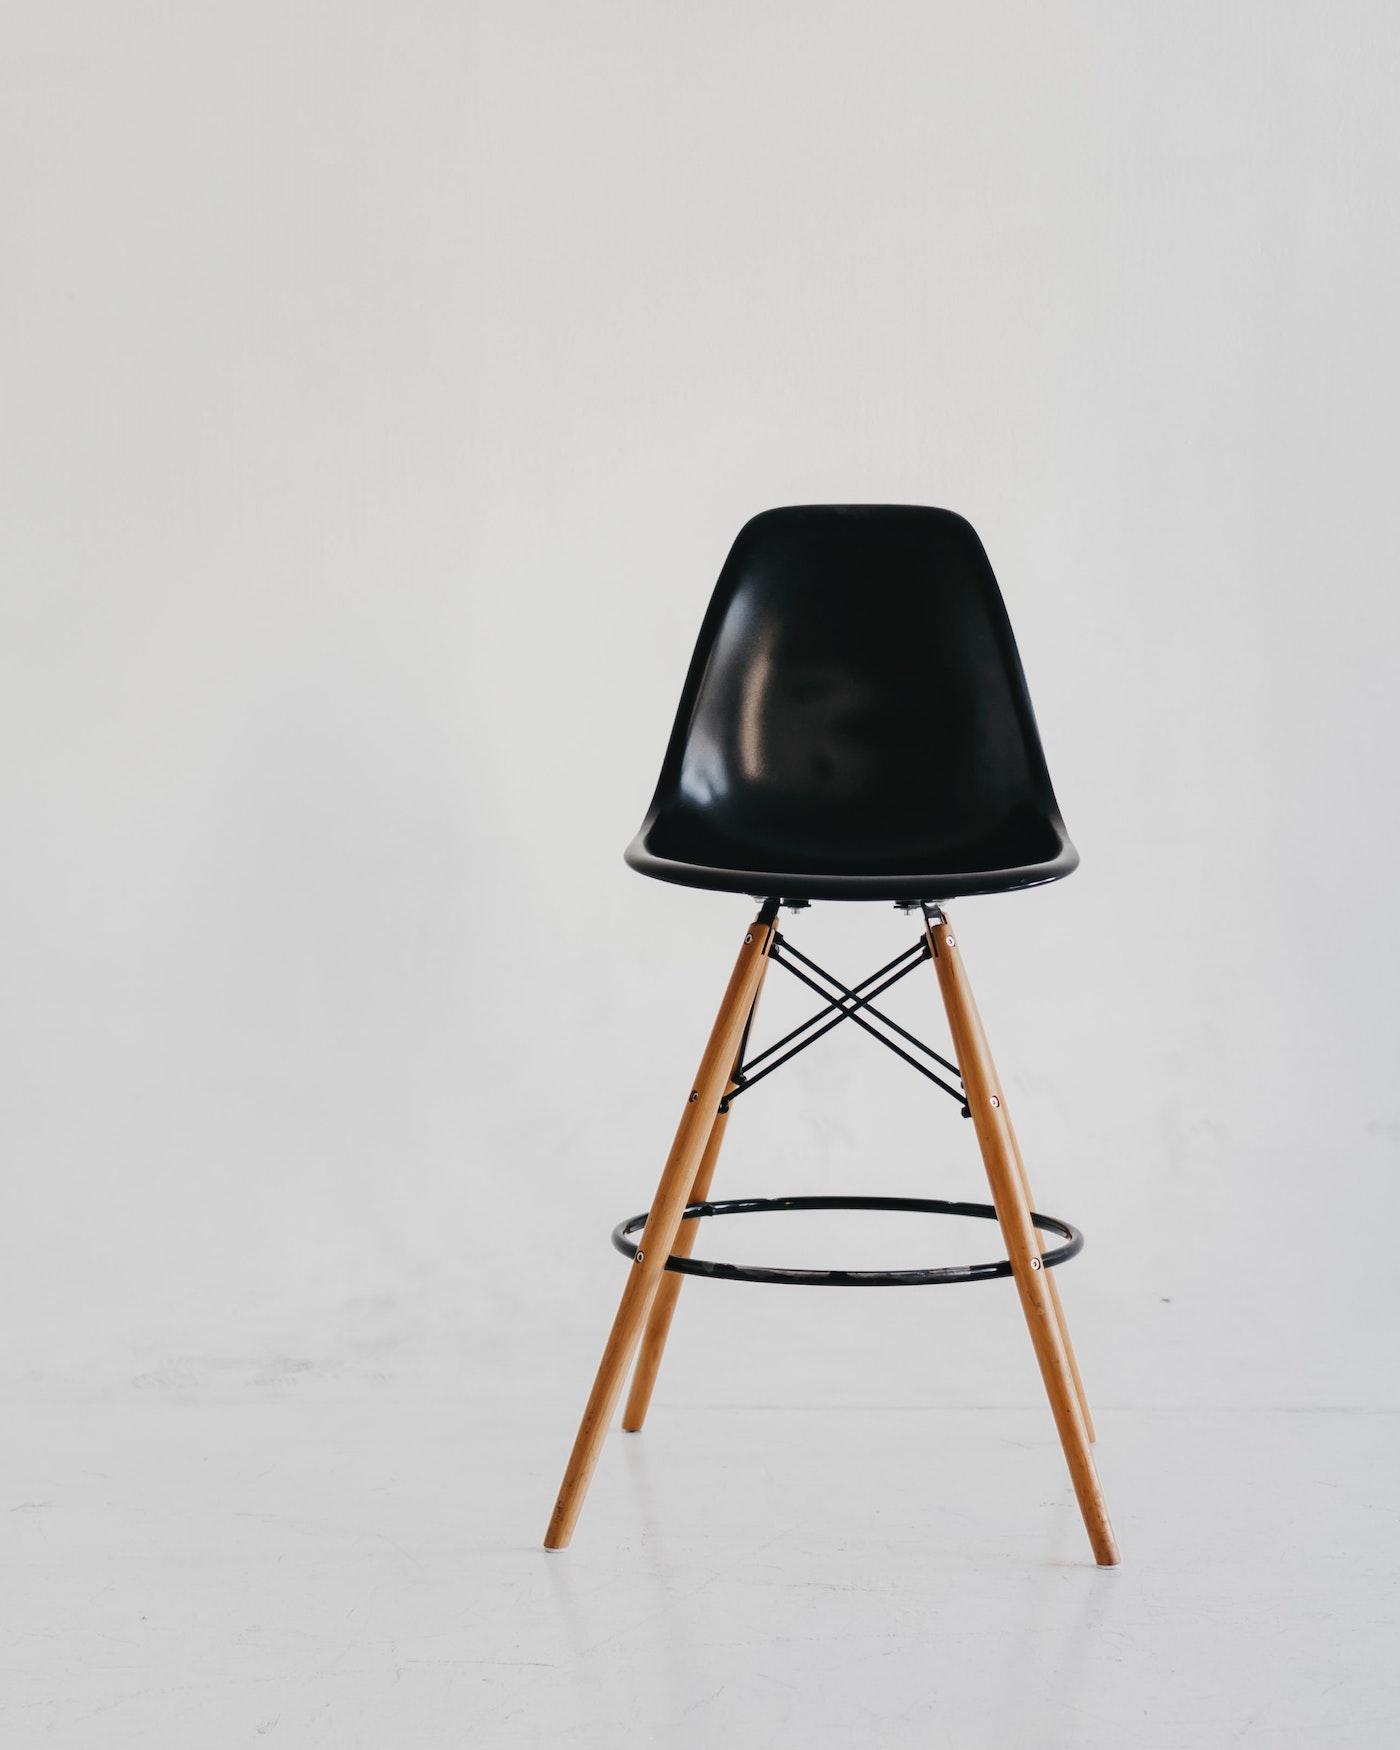 A black simple bar stool